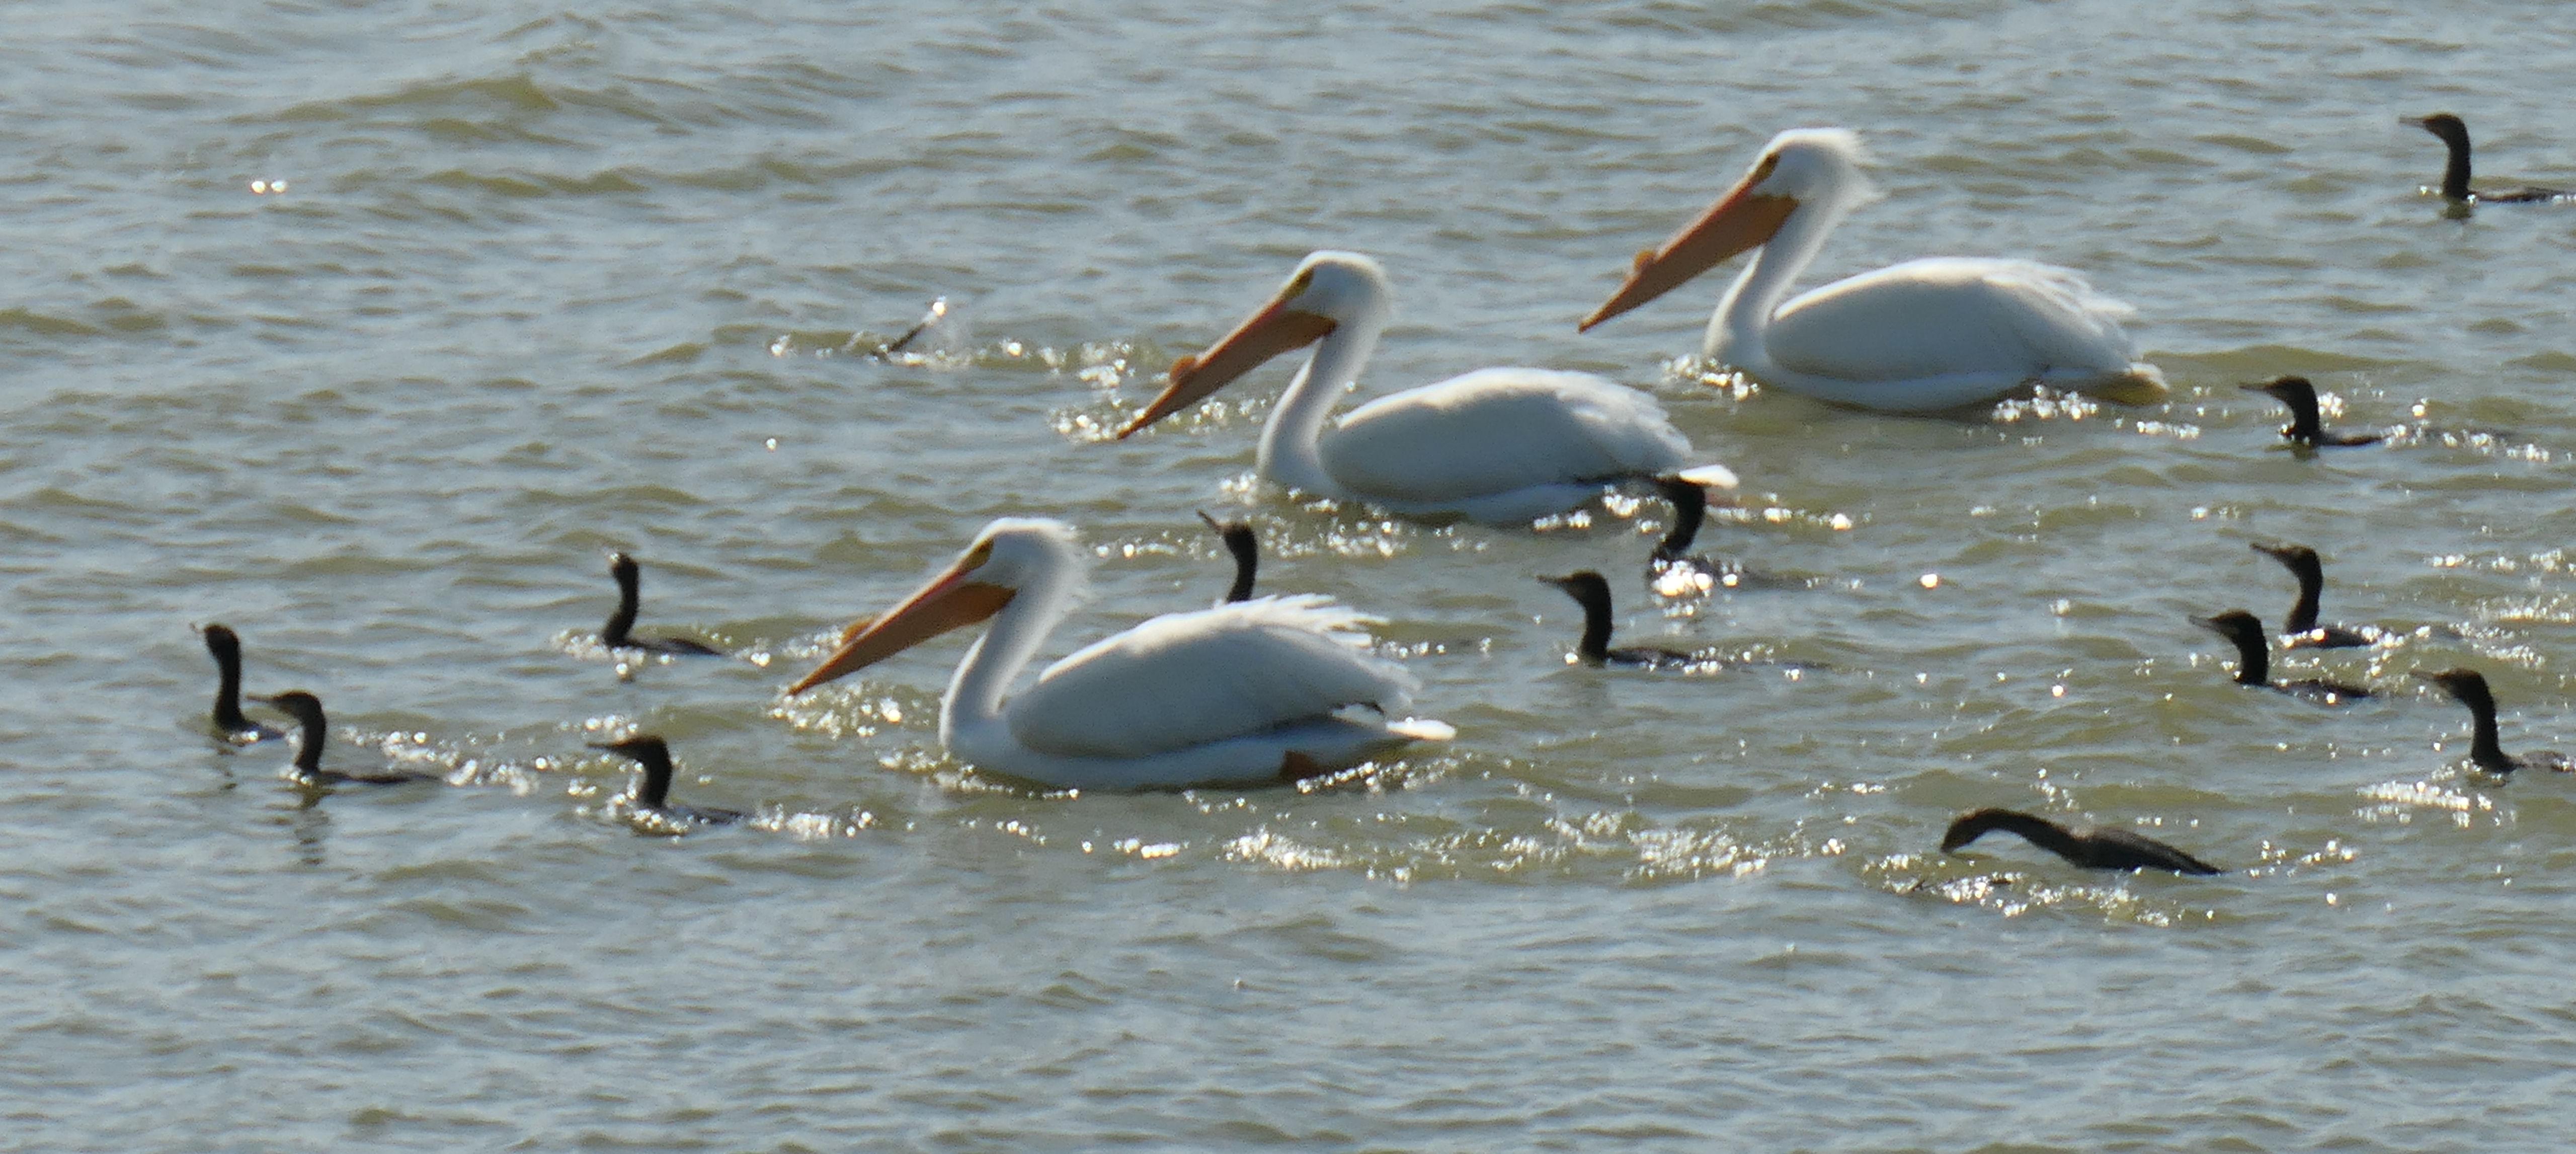 pelican cormorant flotilla